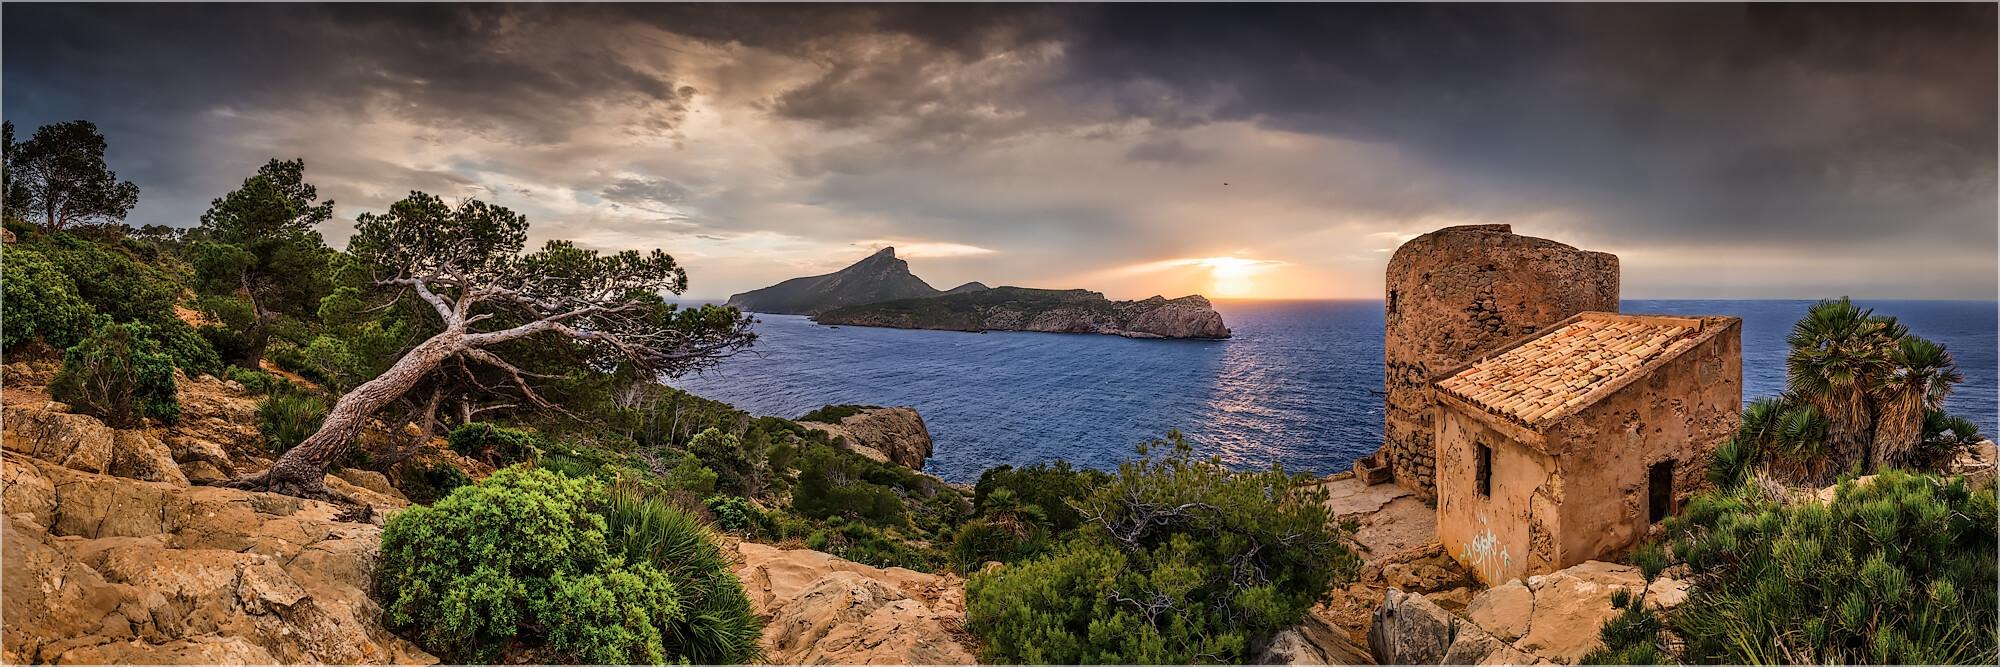 Panoramafoto Spanien Mallorca am Torre en Basset